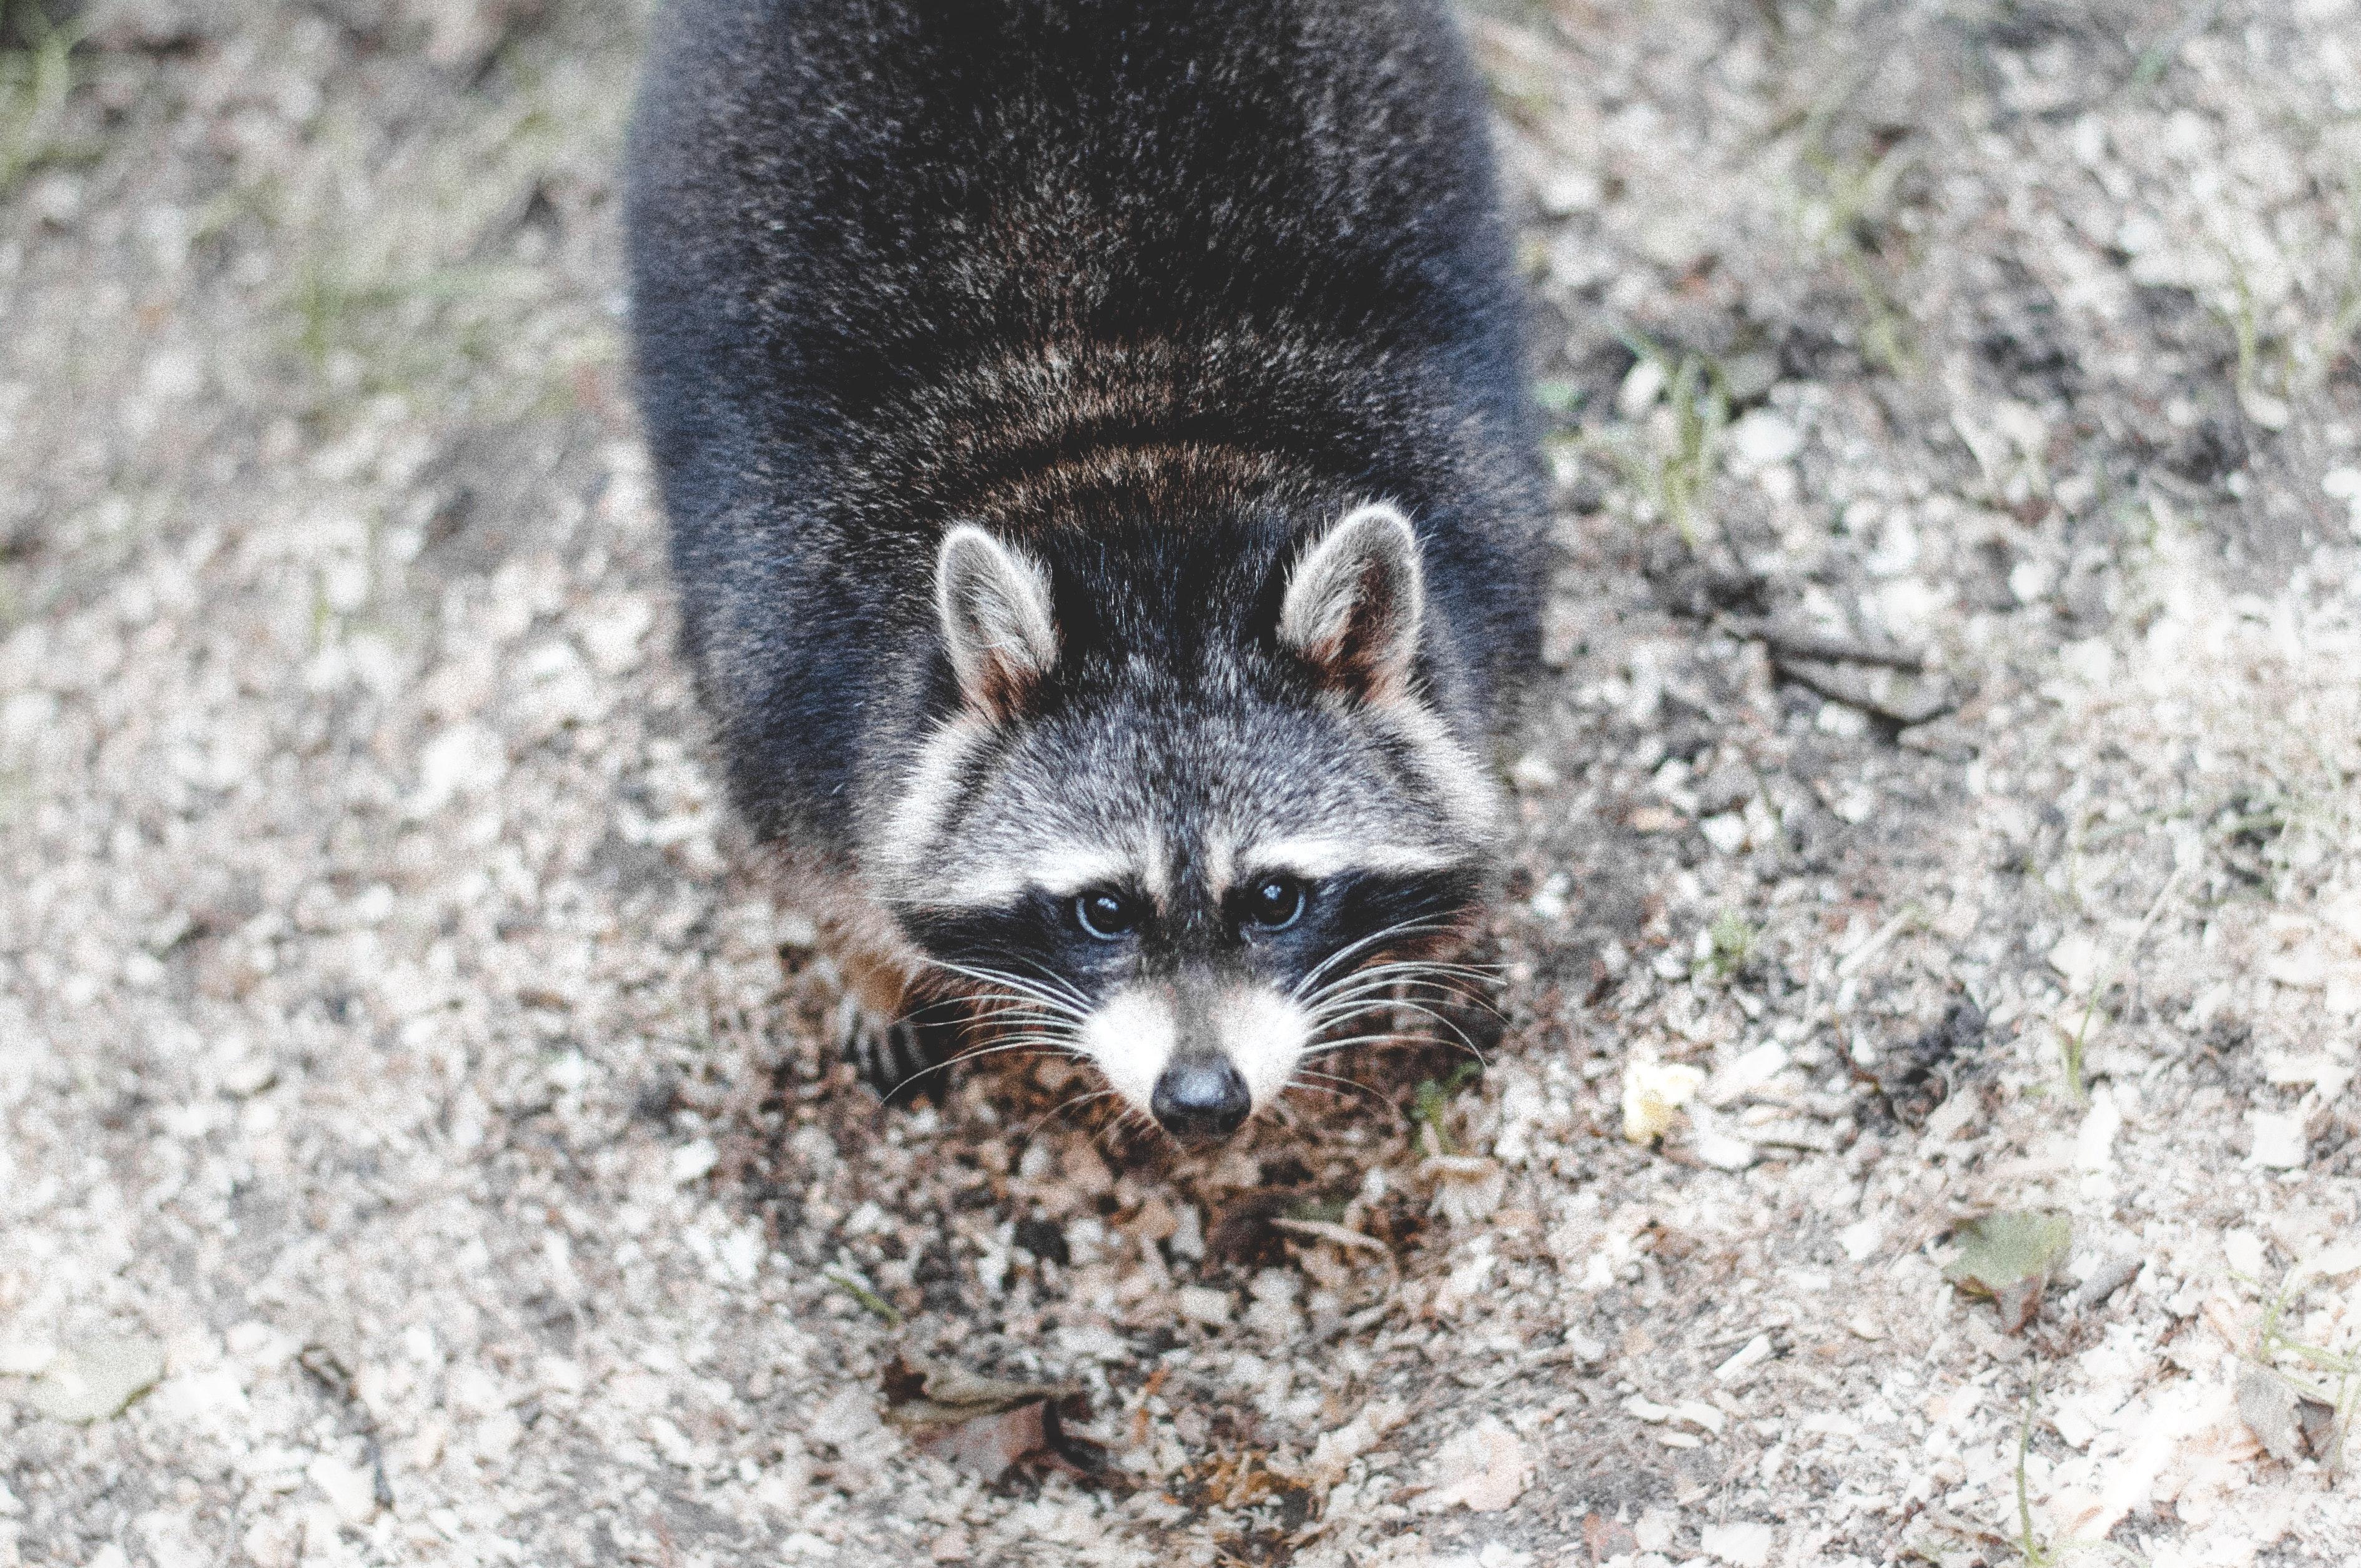 Brown And Black Raccoon Photo 183 Free Stock Photo